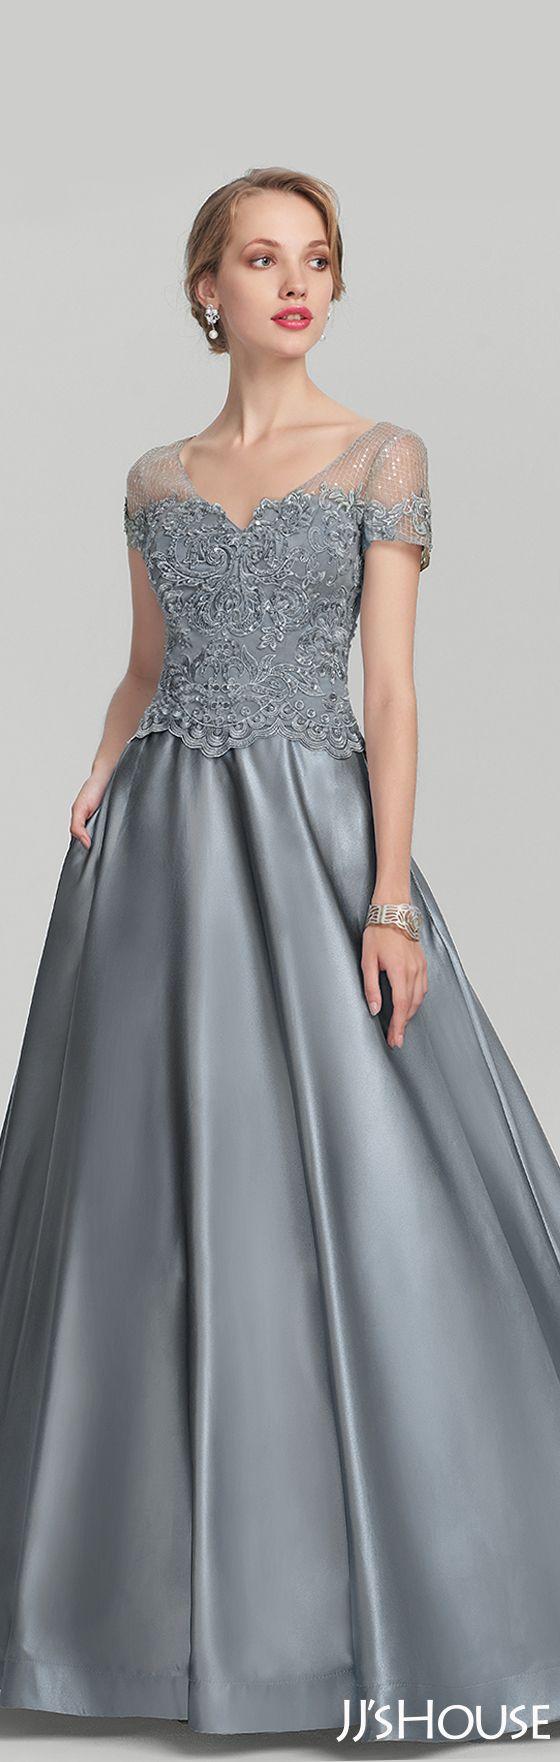 A-Line/Princess V-neck Floor-Length Satin Lace Mother of the Bride ...